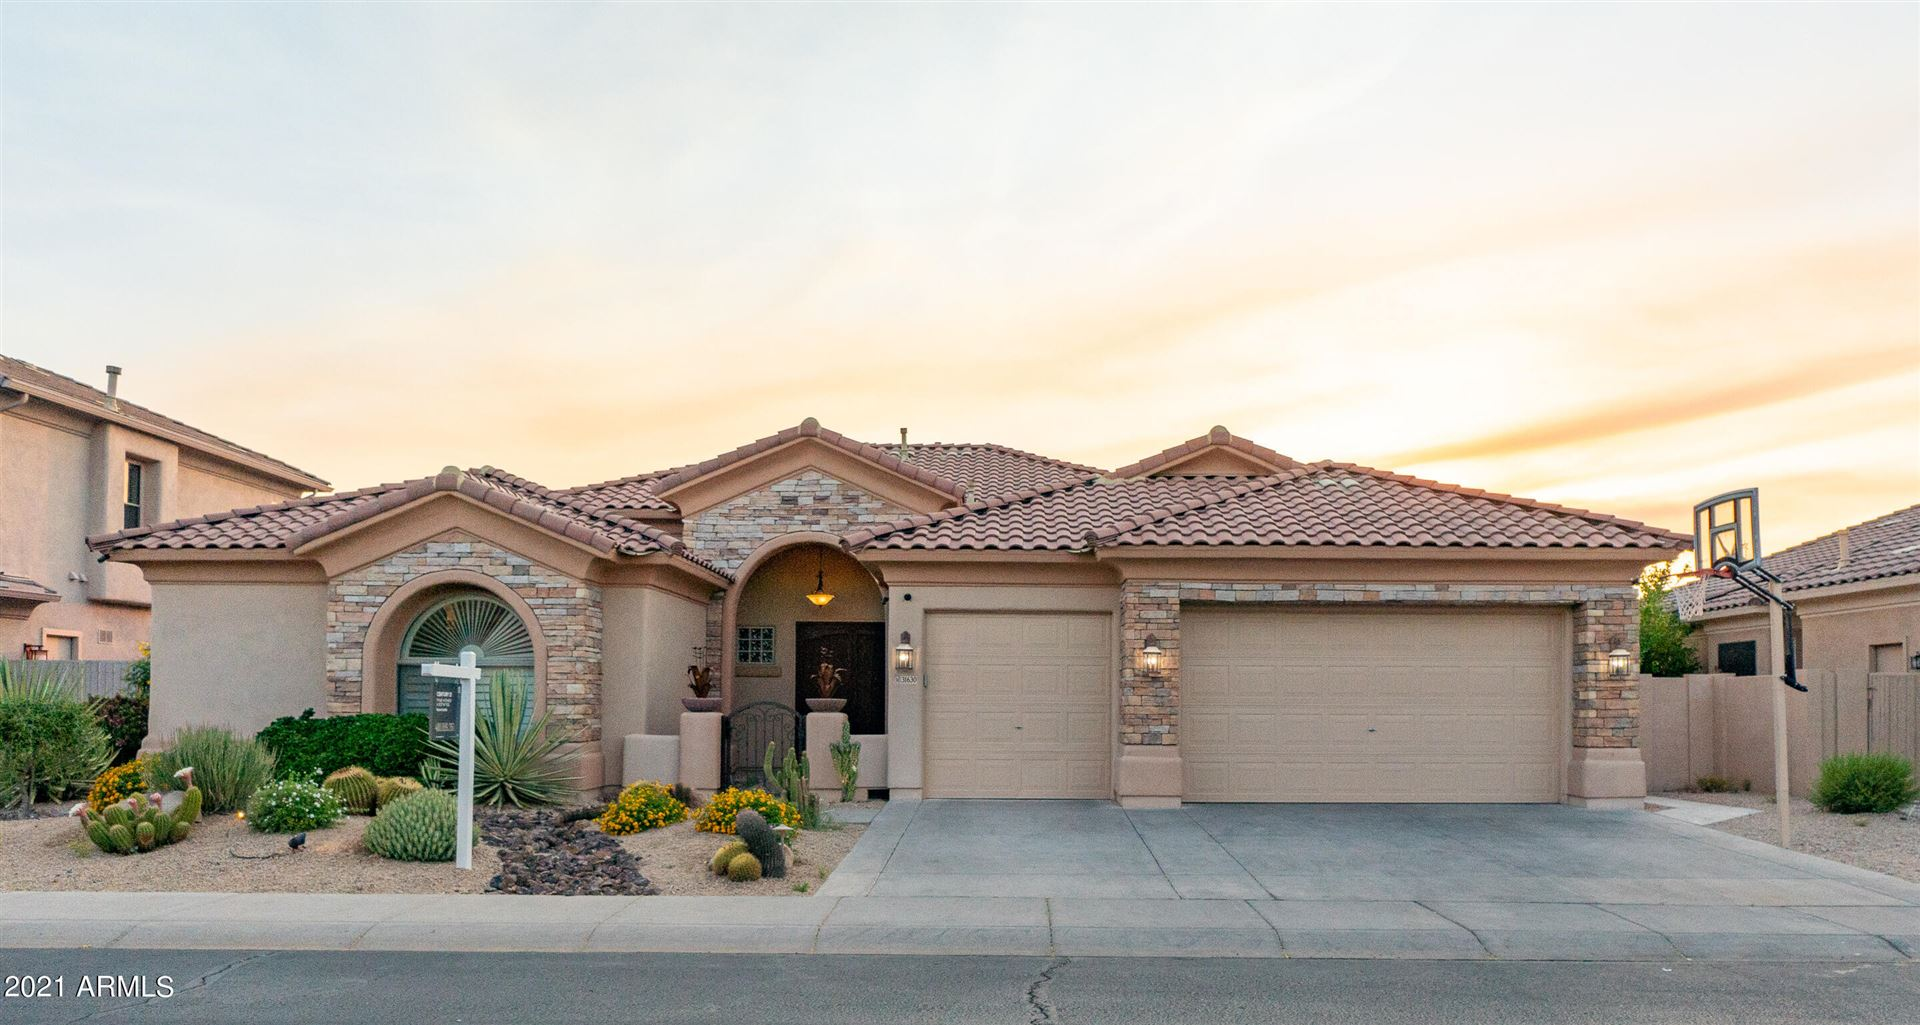 31630 N 54th Place, Cave Creek, AZ 85331 - MLS#: 6210398